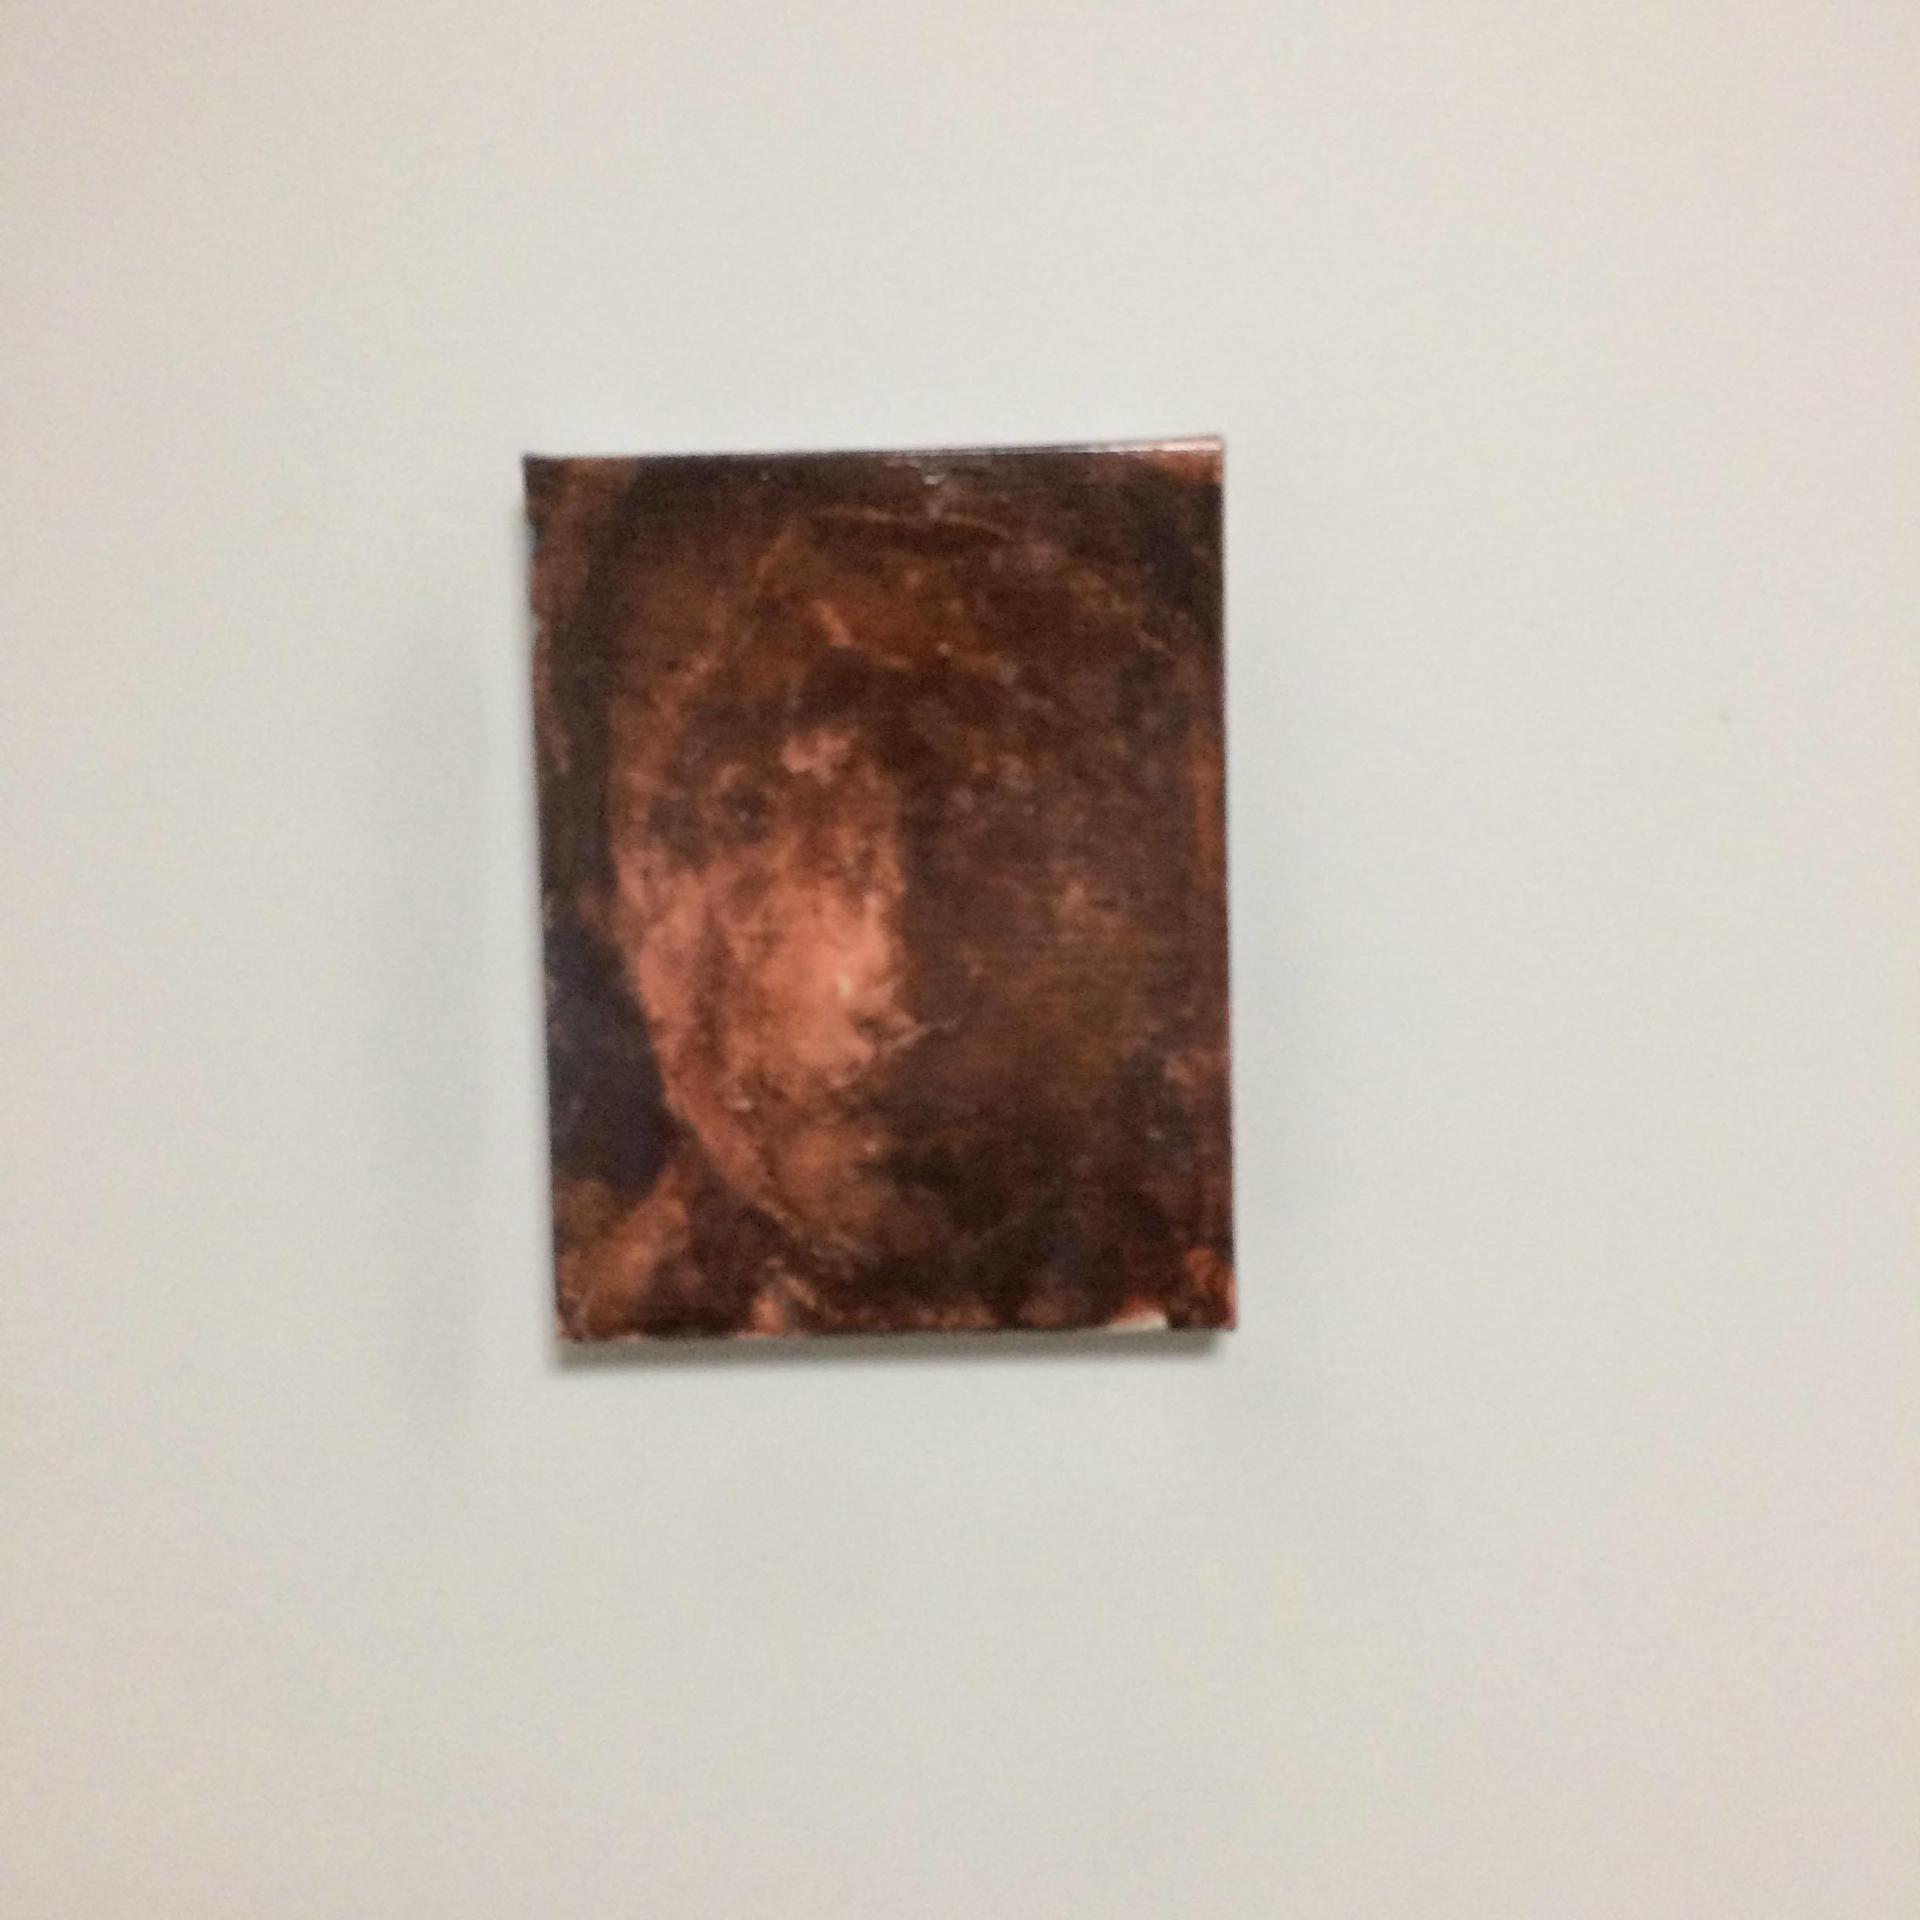 Face I by Yushi Dangami